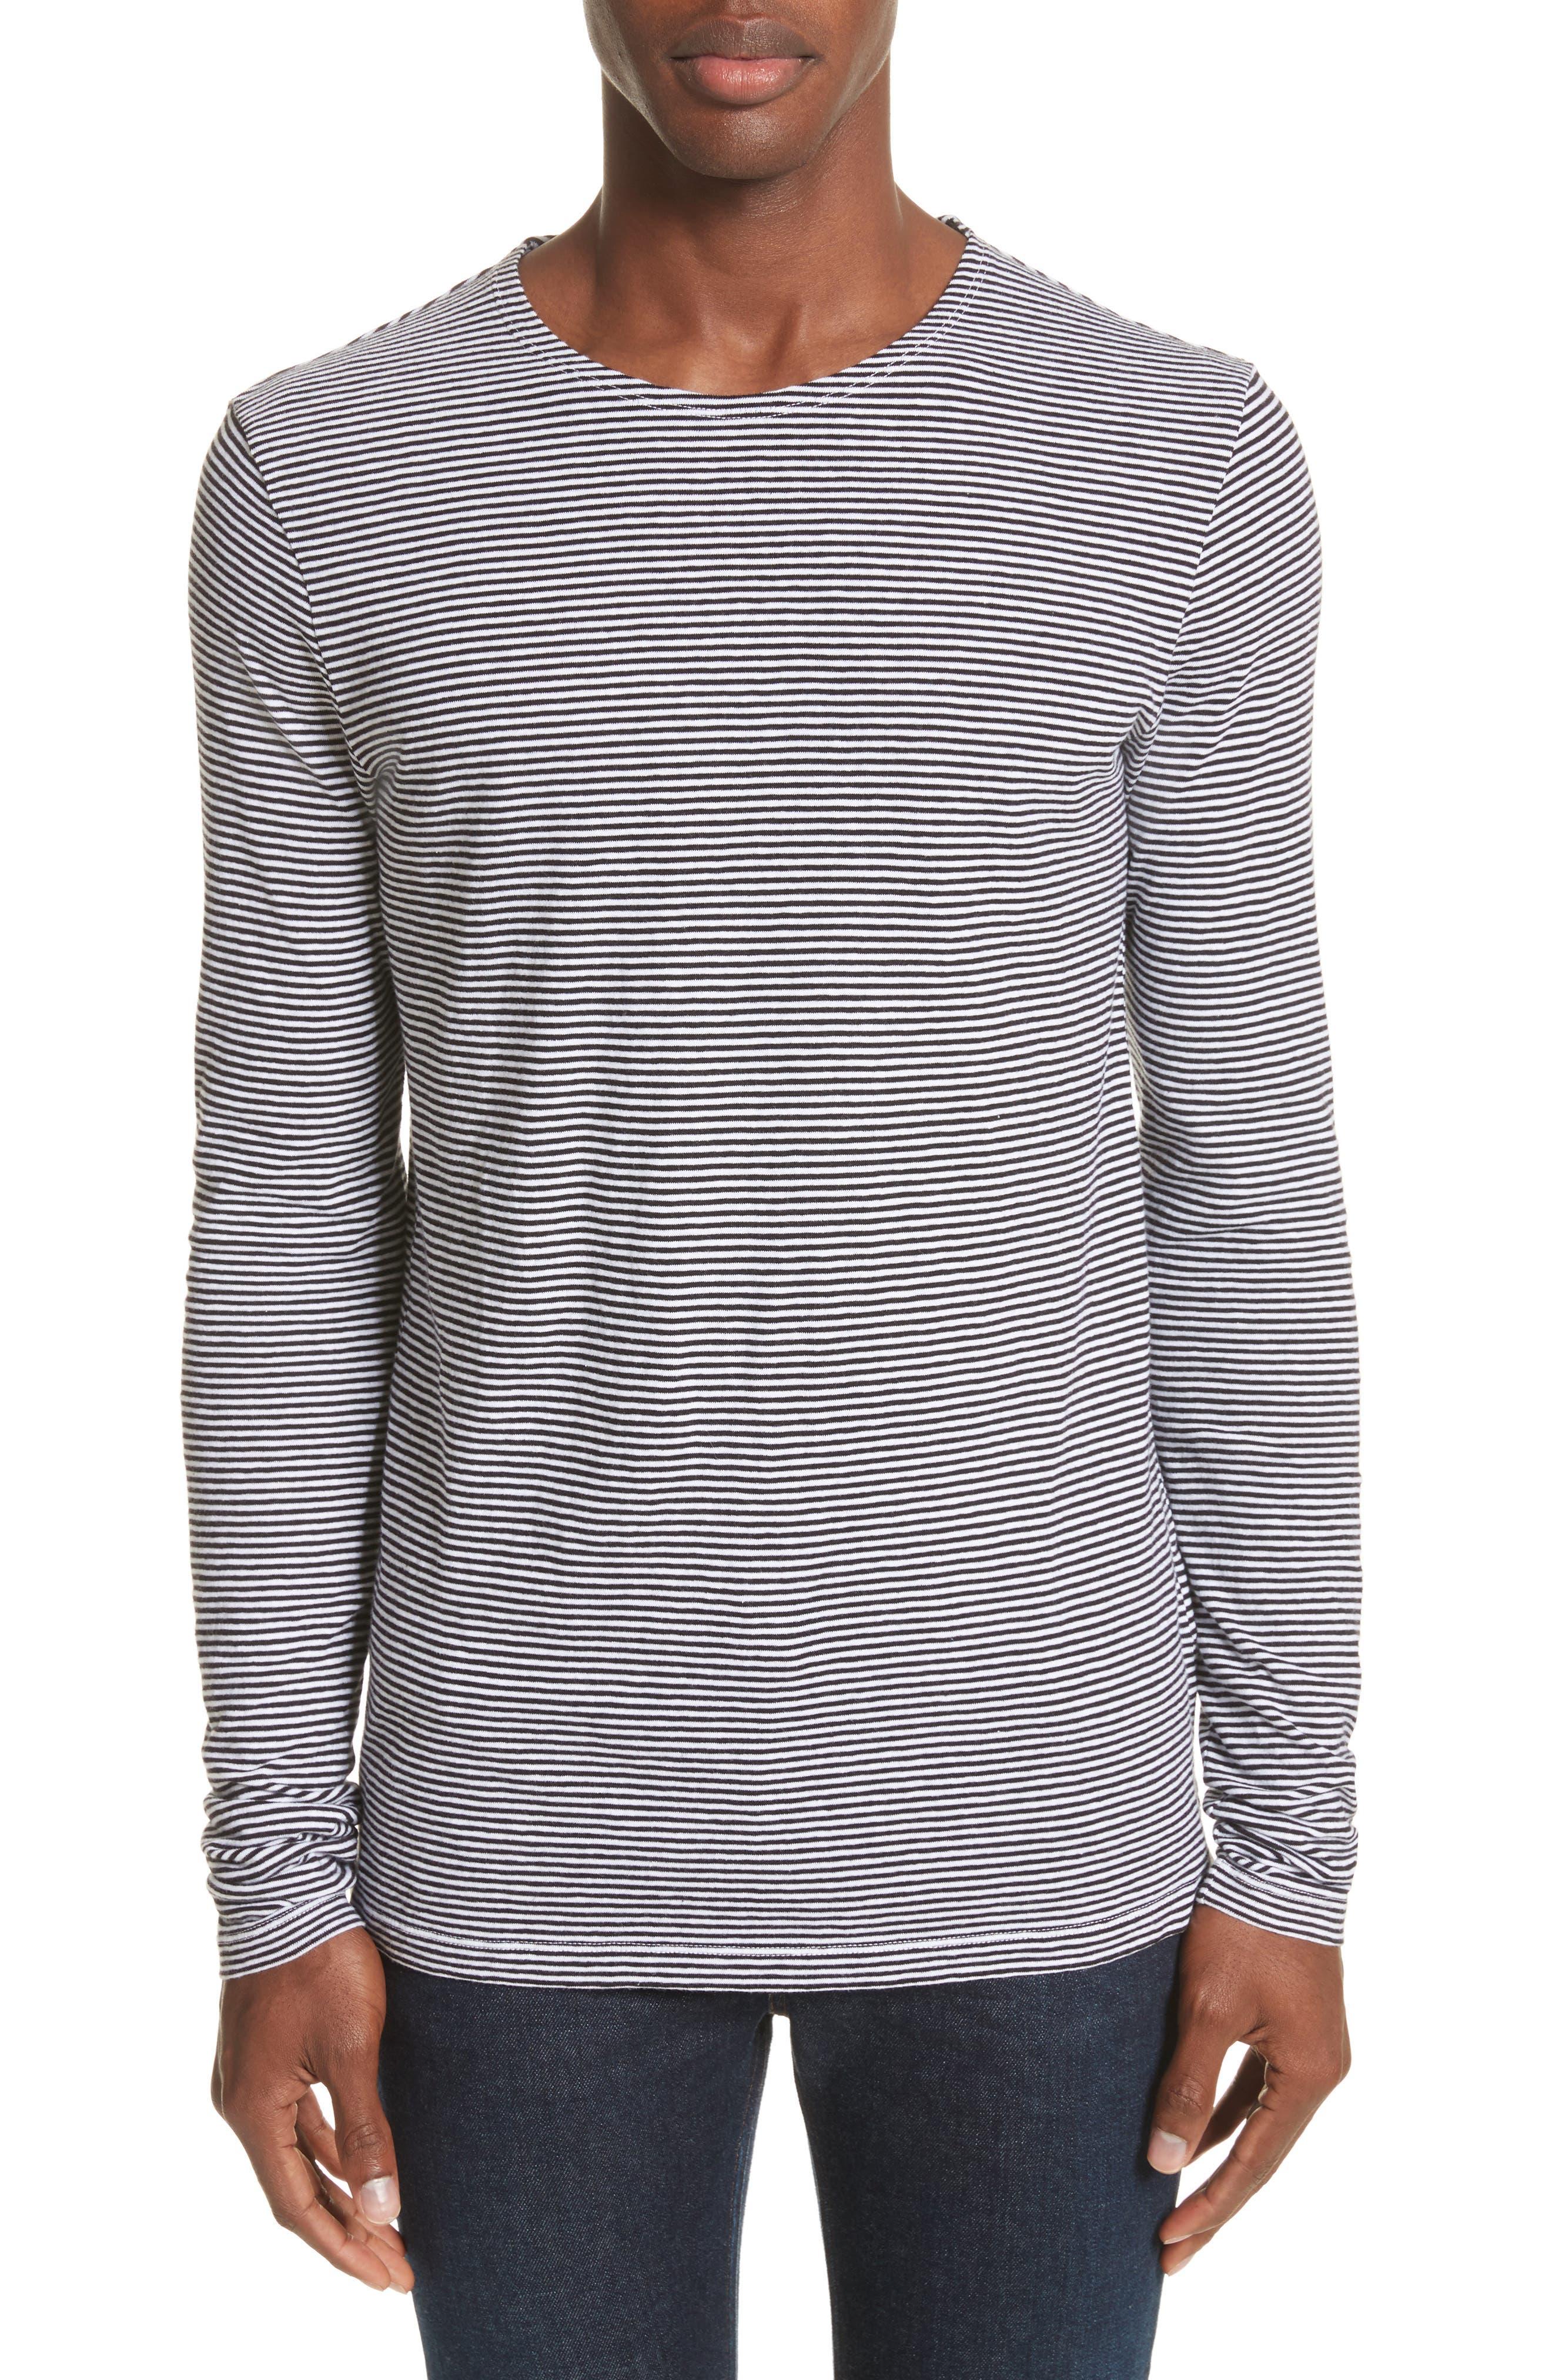 Tayford Stripe Long Sleeve T-Shirt,                         Main,                         color, 100